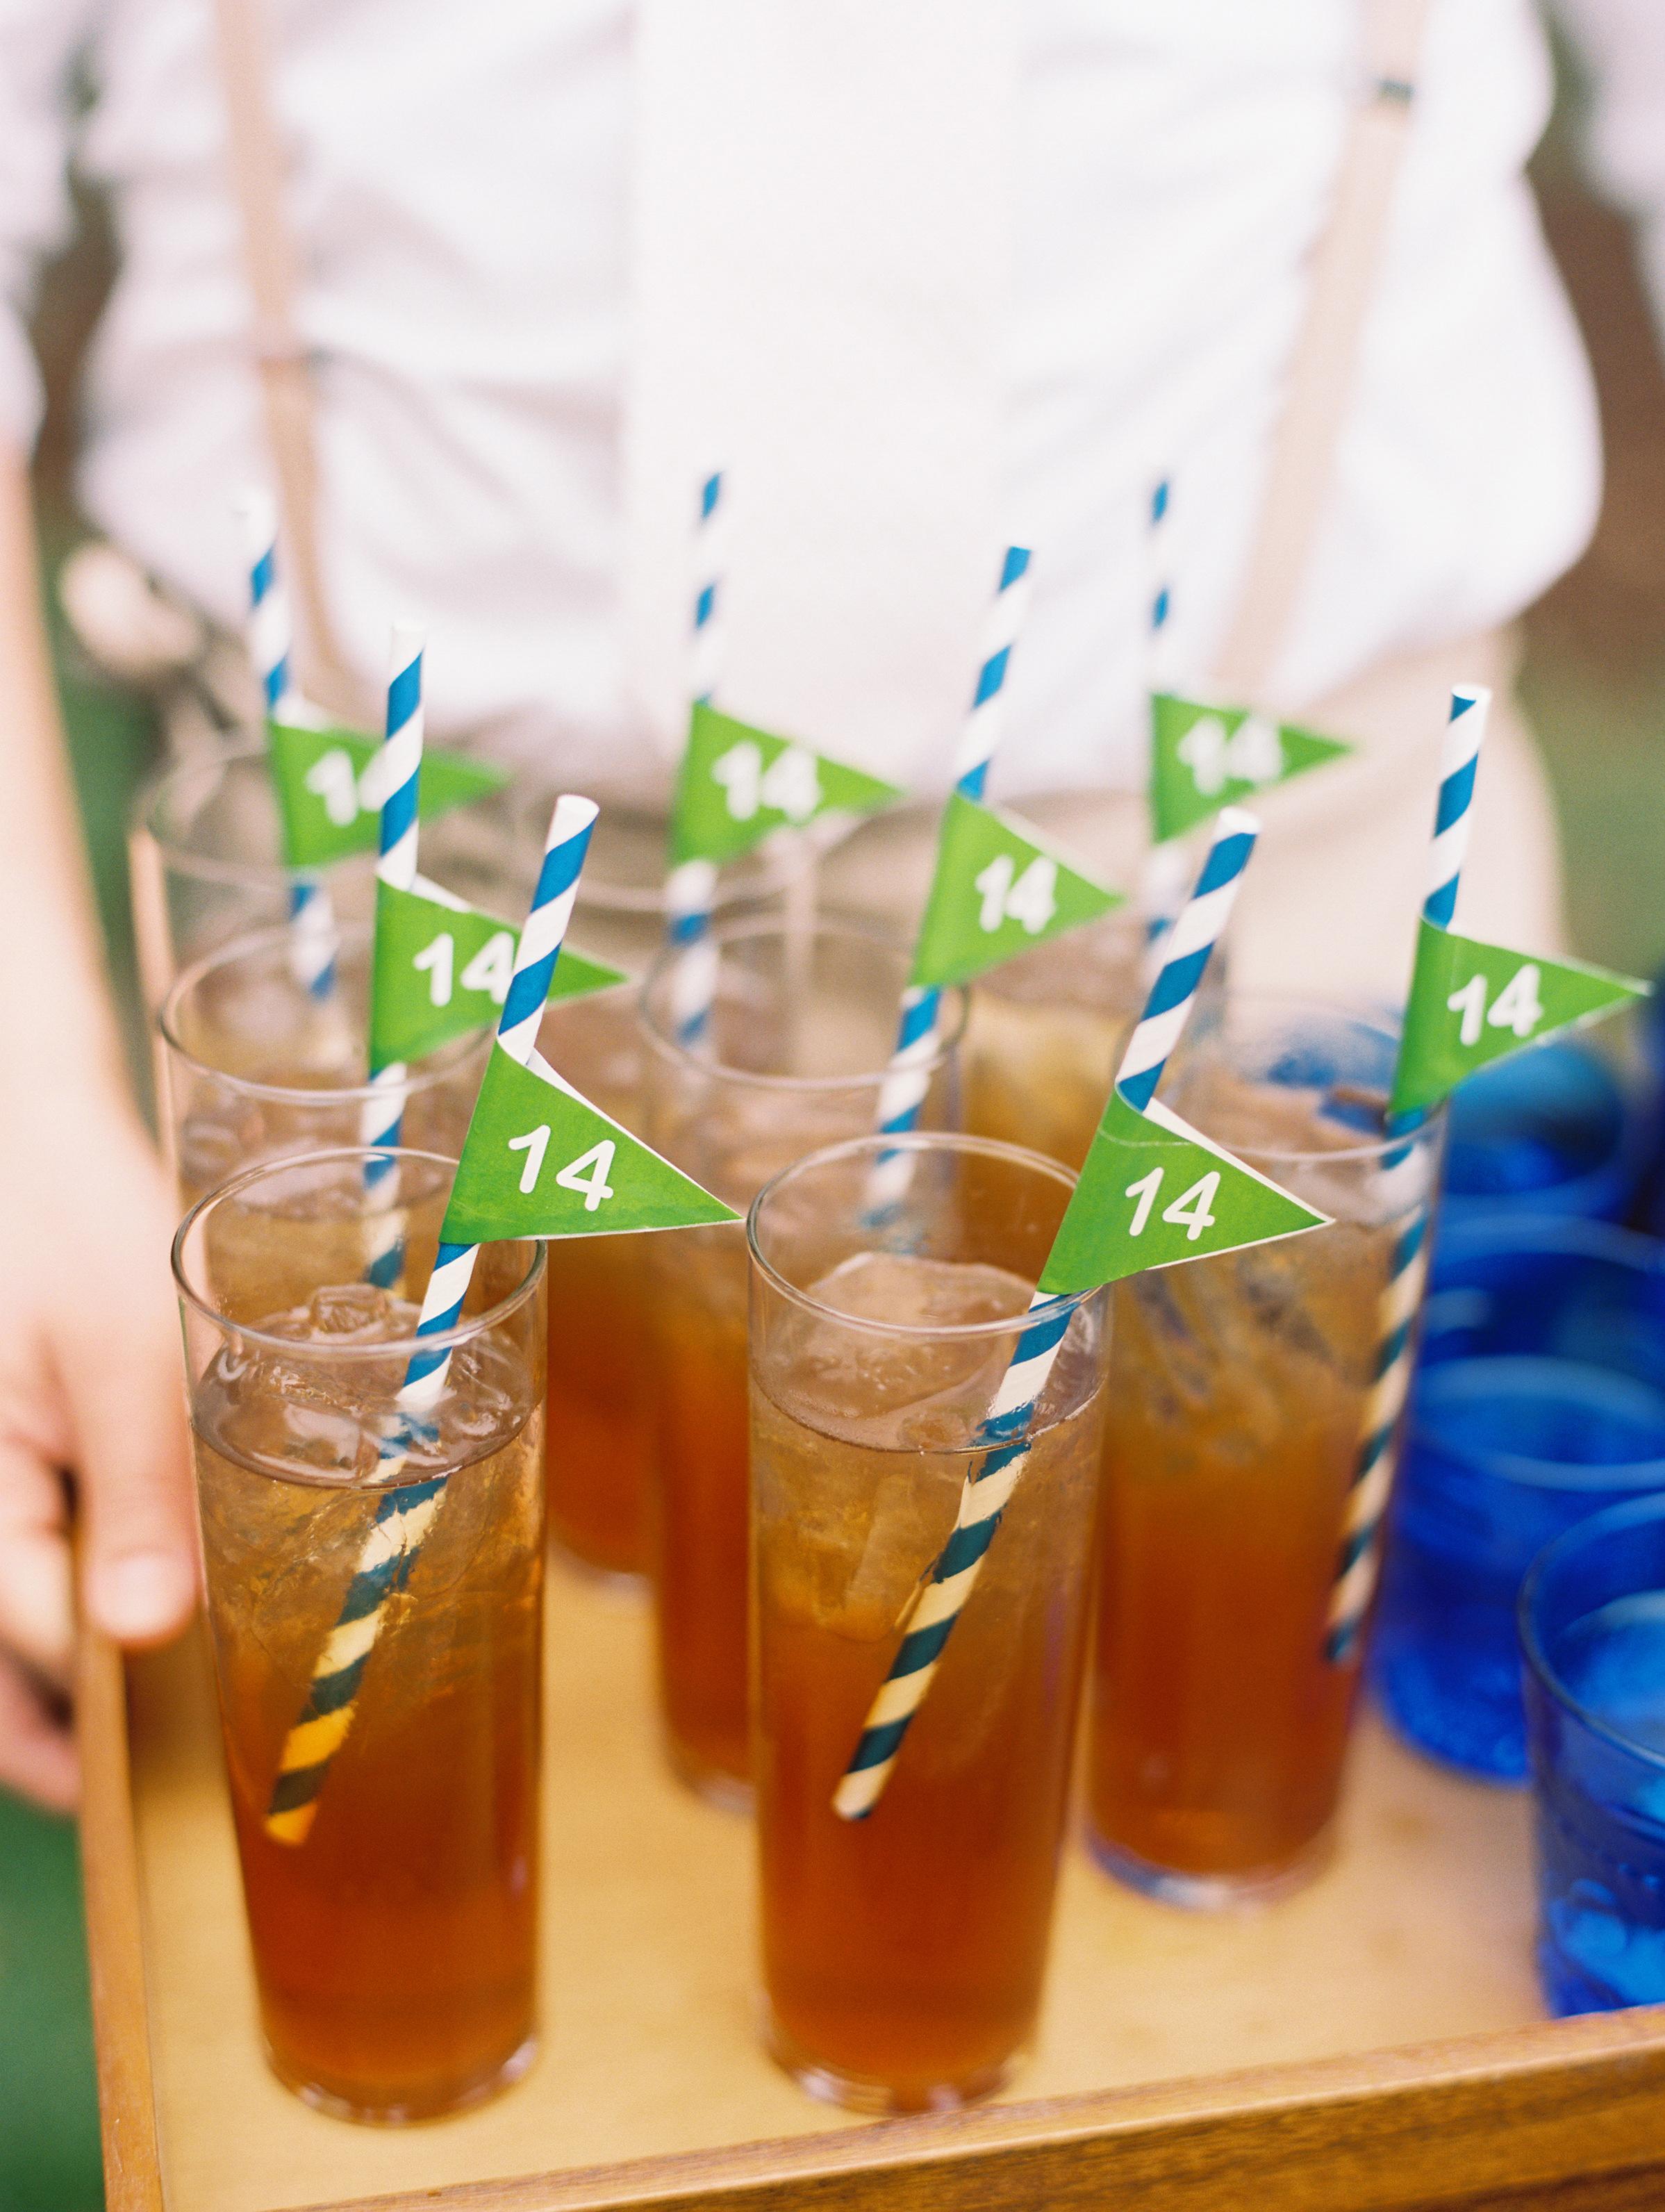 kendall nick wedding drinks with straws